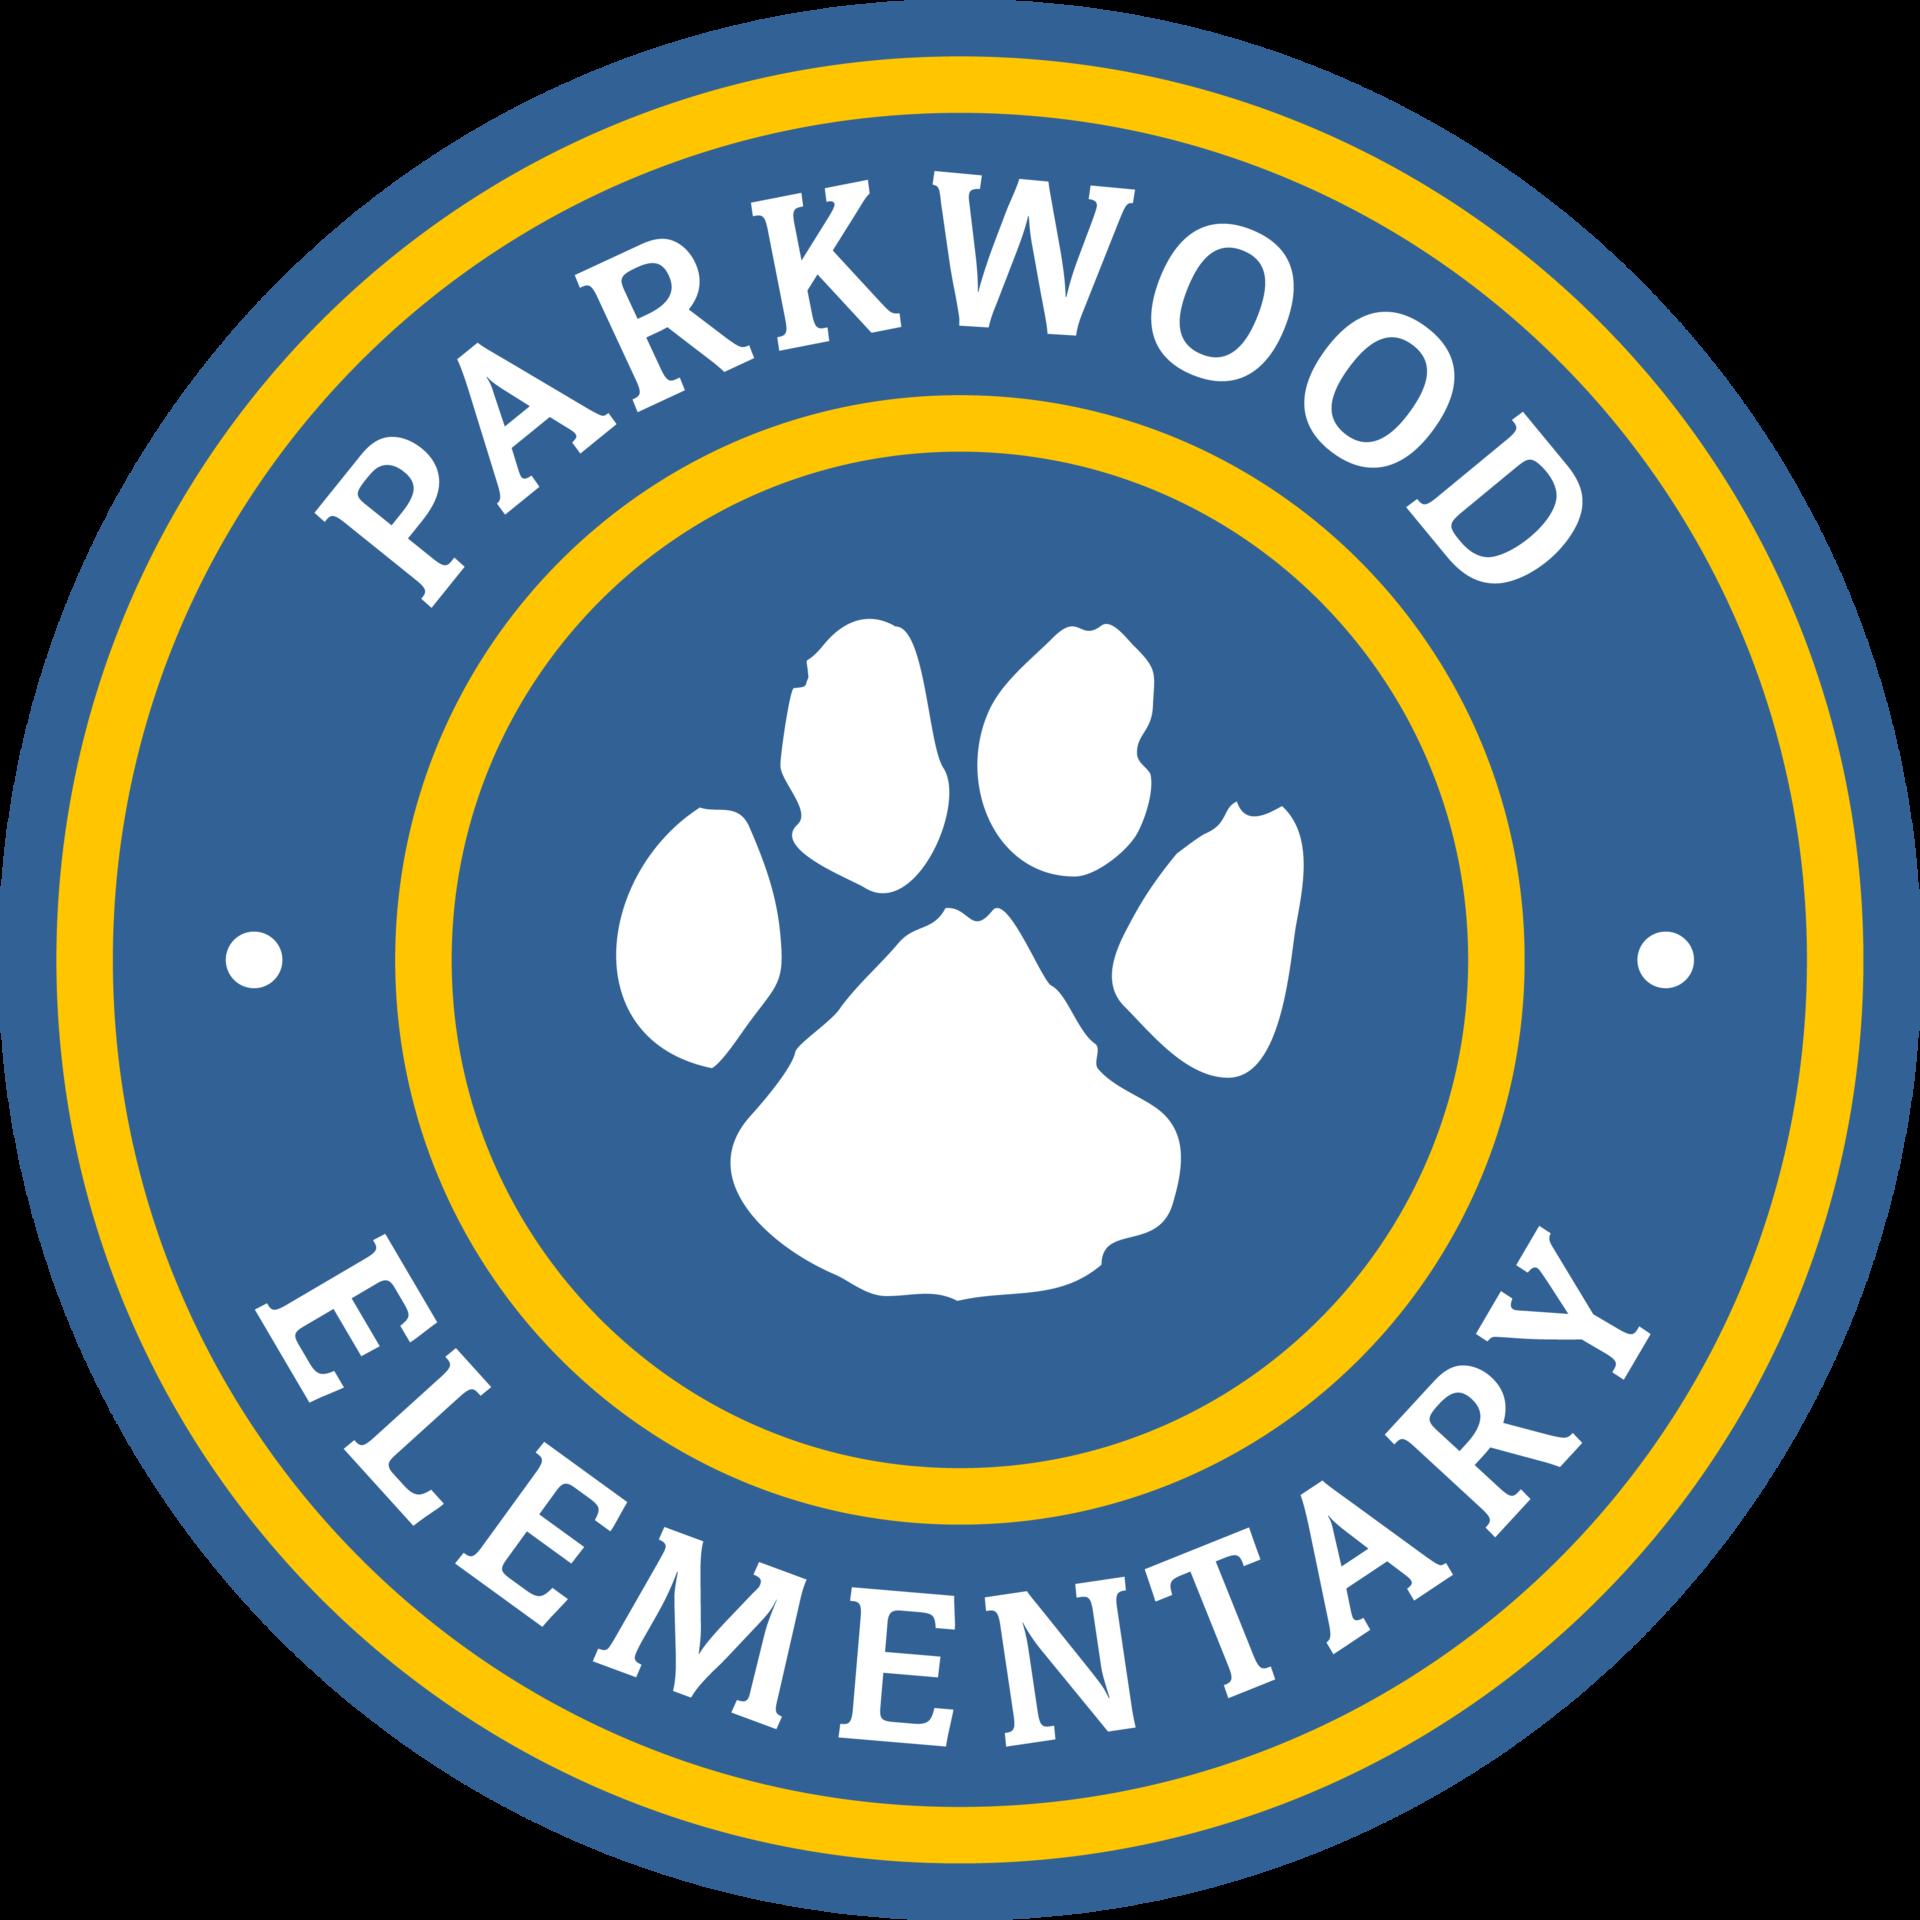 Parkwood Elementary's school seal